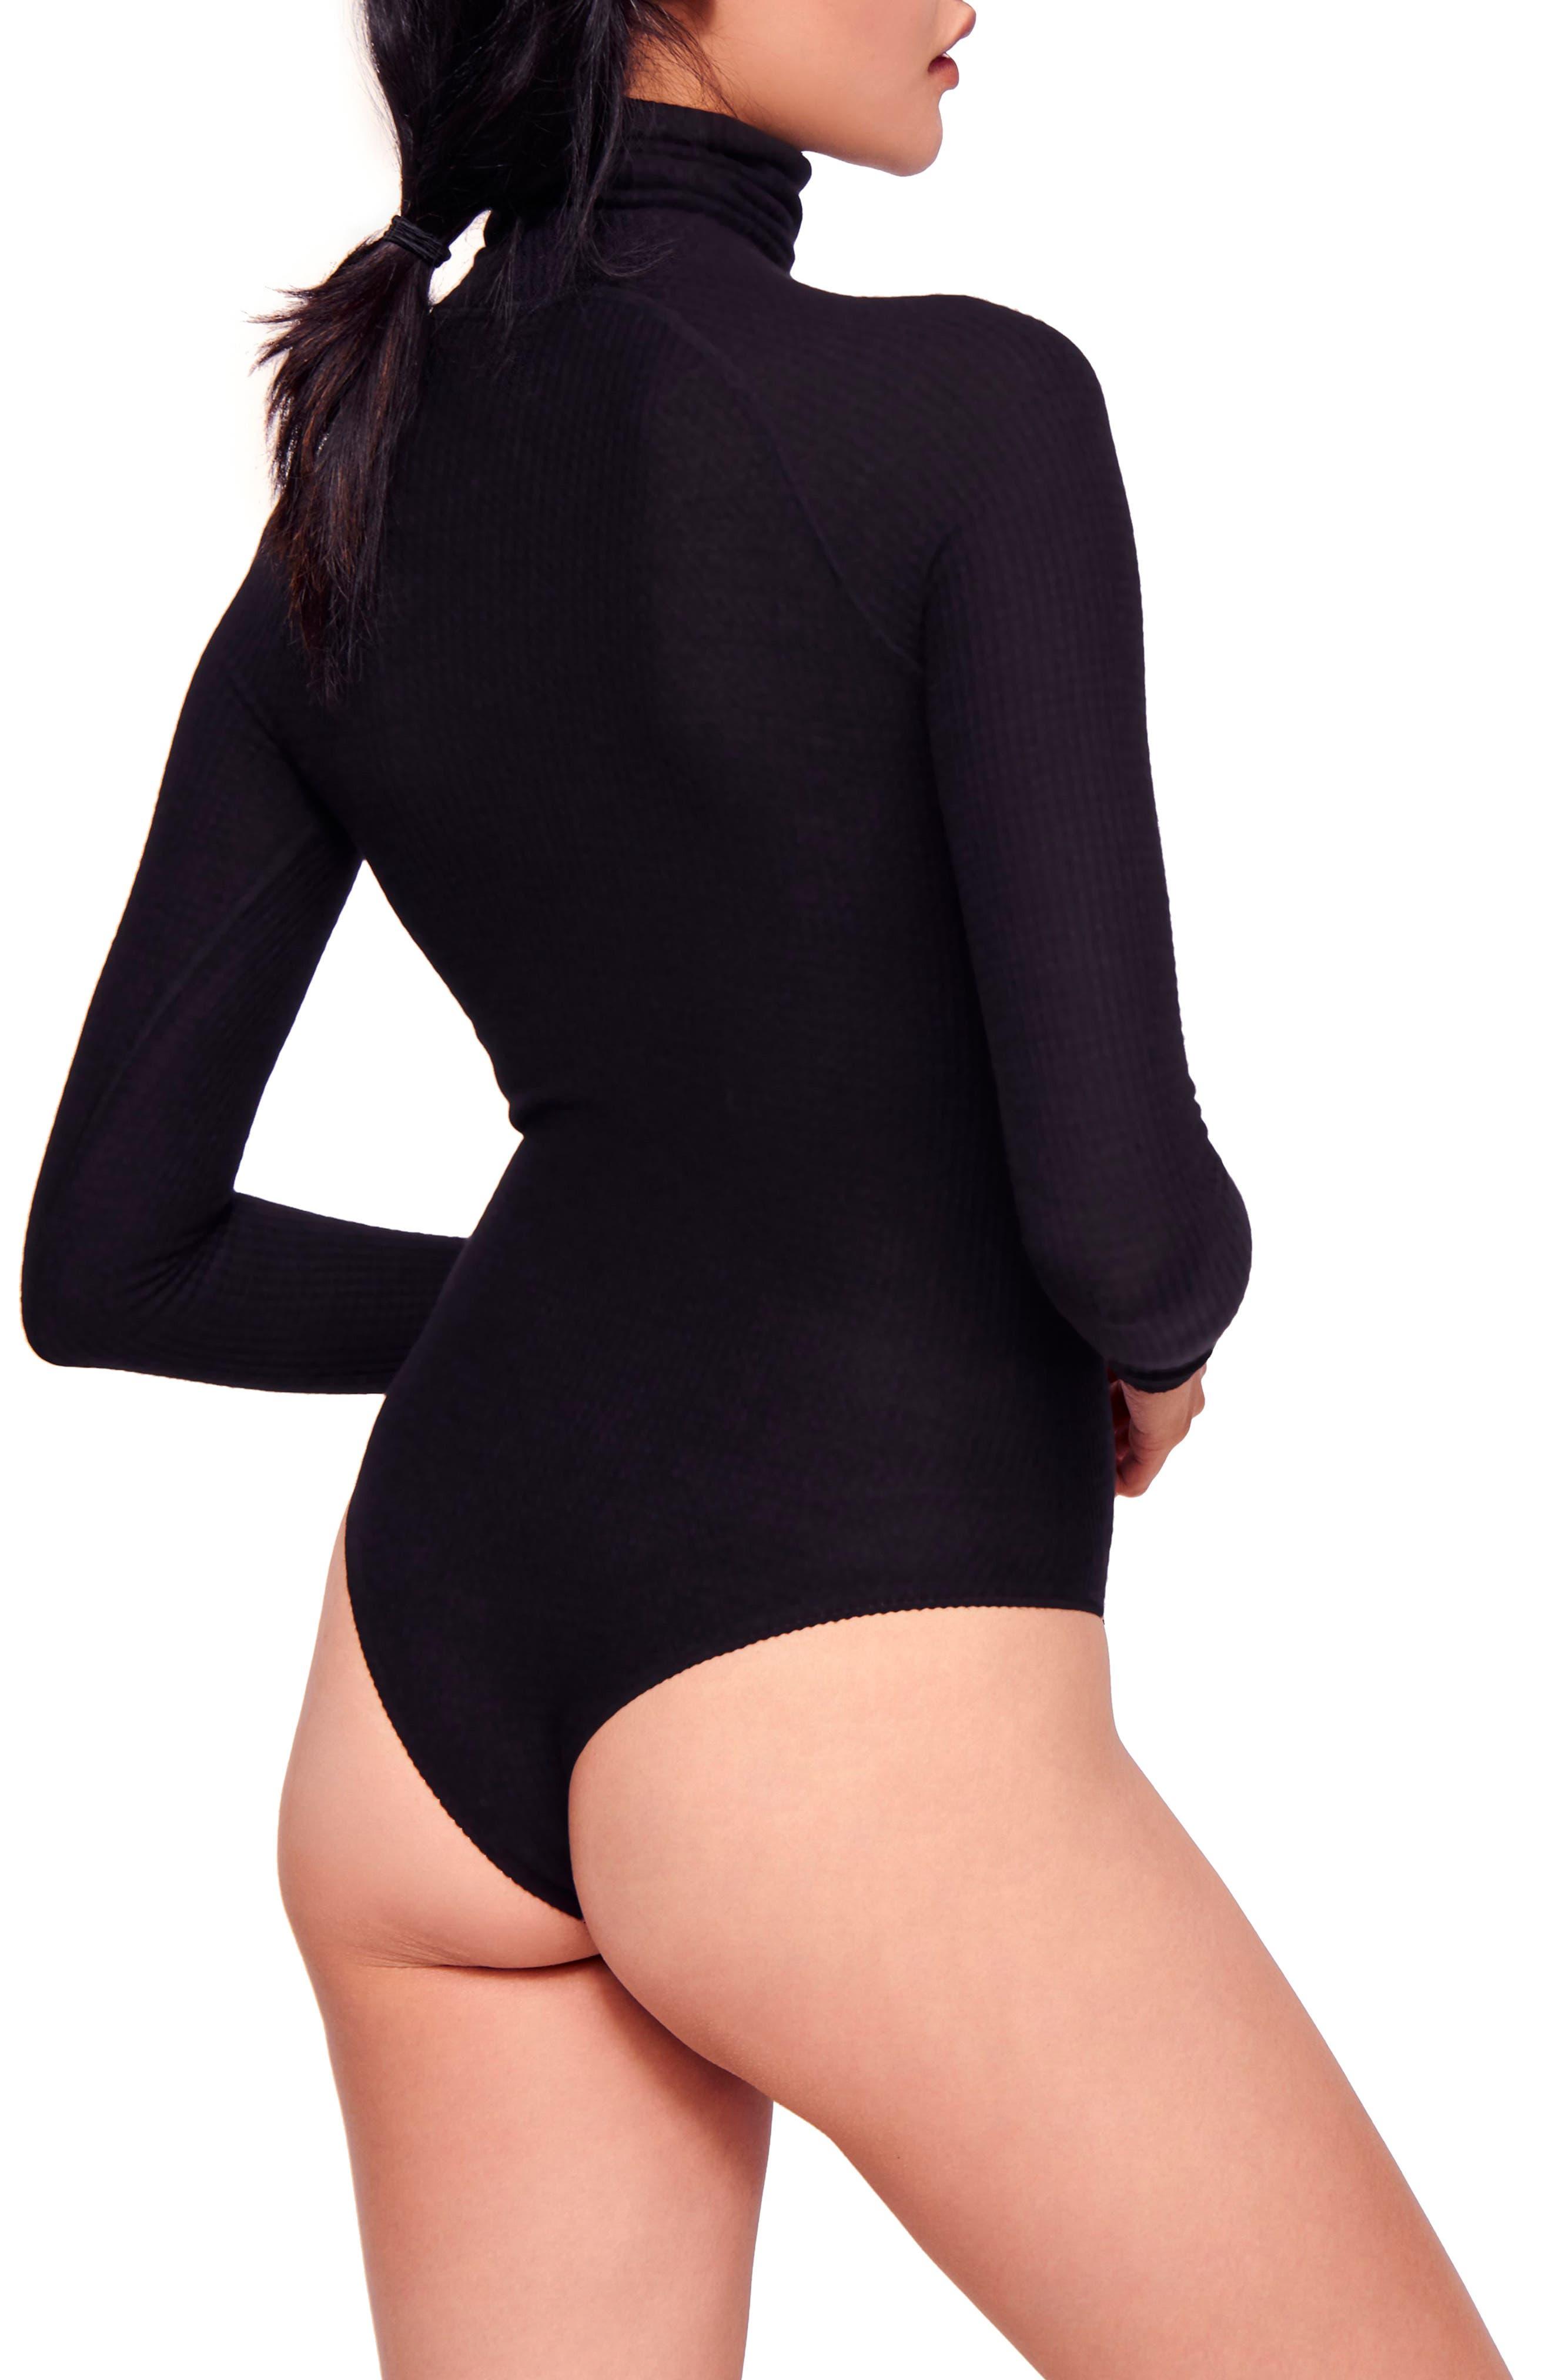 All You Want Bodysuit,                             Alternate thumbnail 3, color,                             001